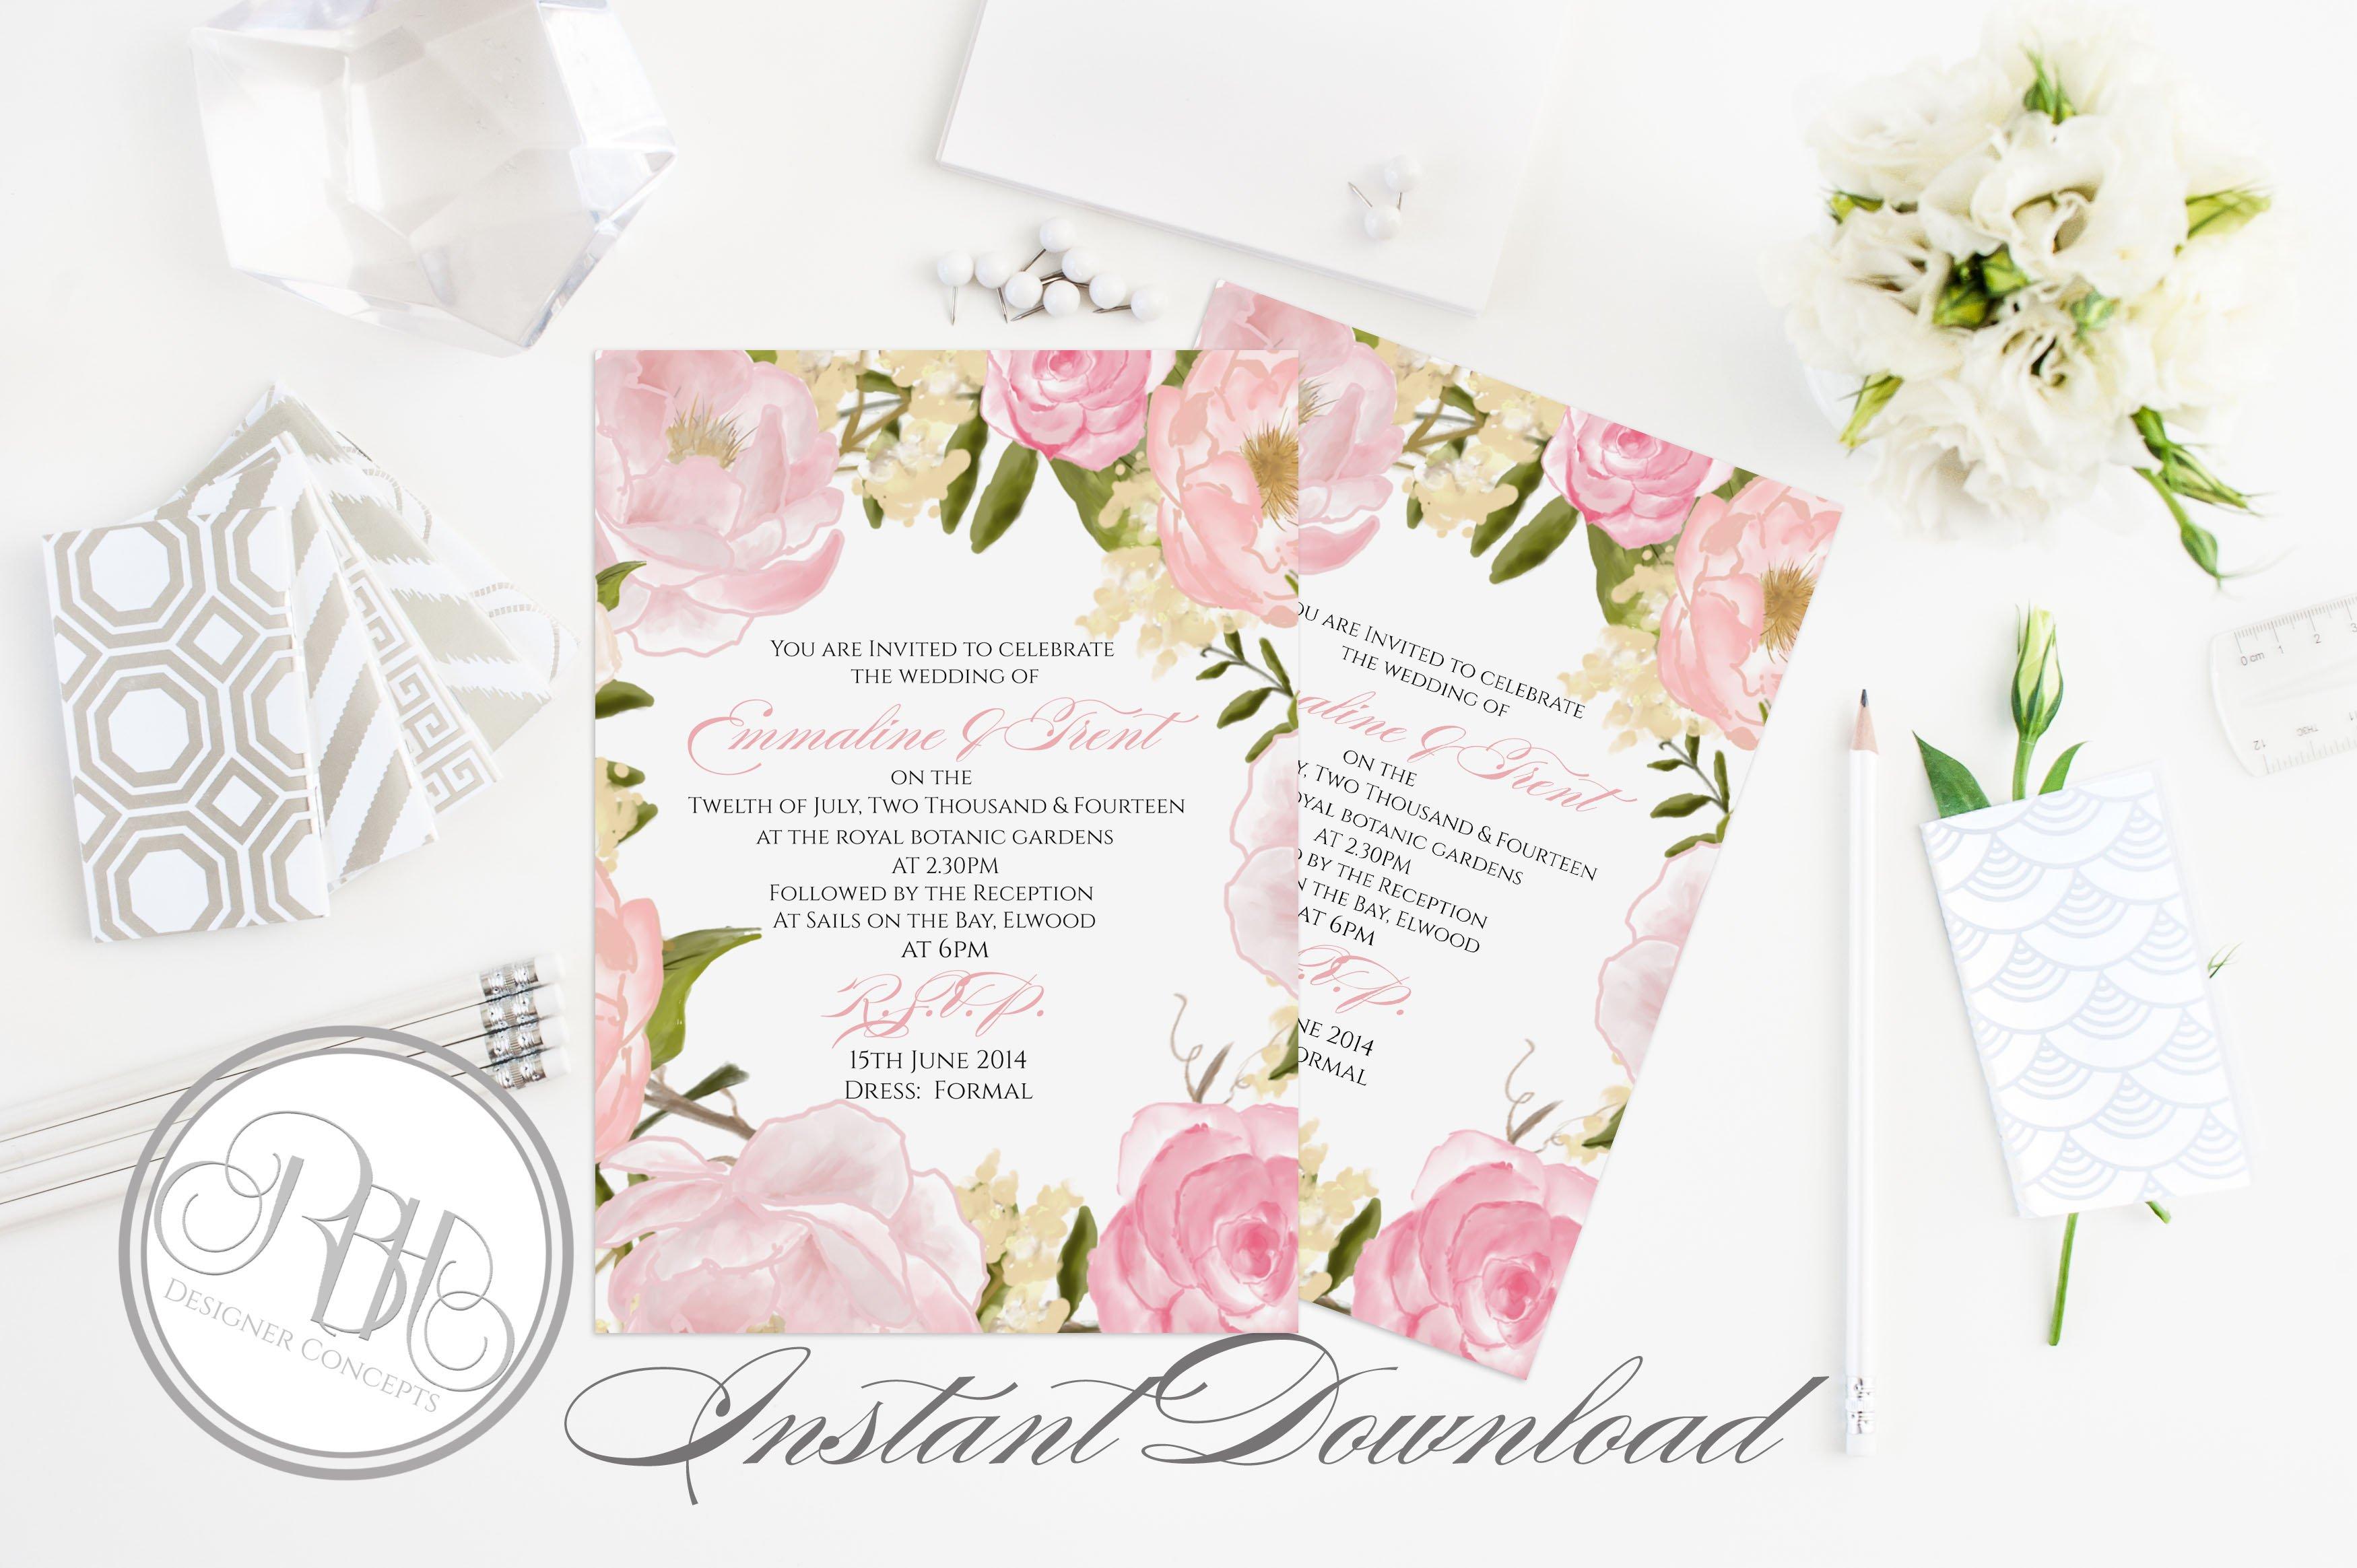 Rustic Peonies Wedding Invitation ~ Templates ~ Creative Market